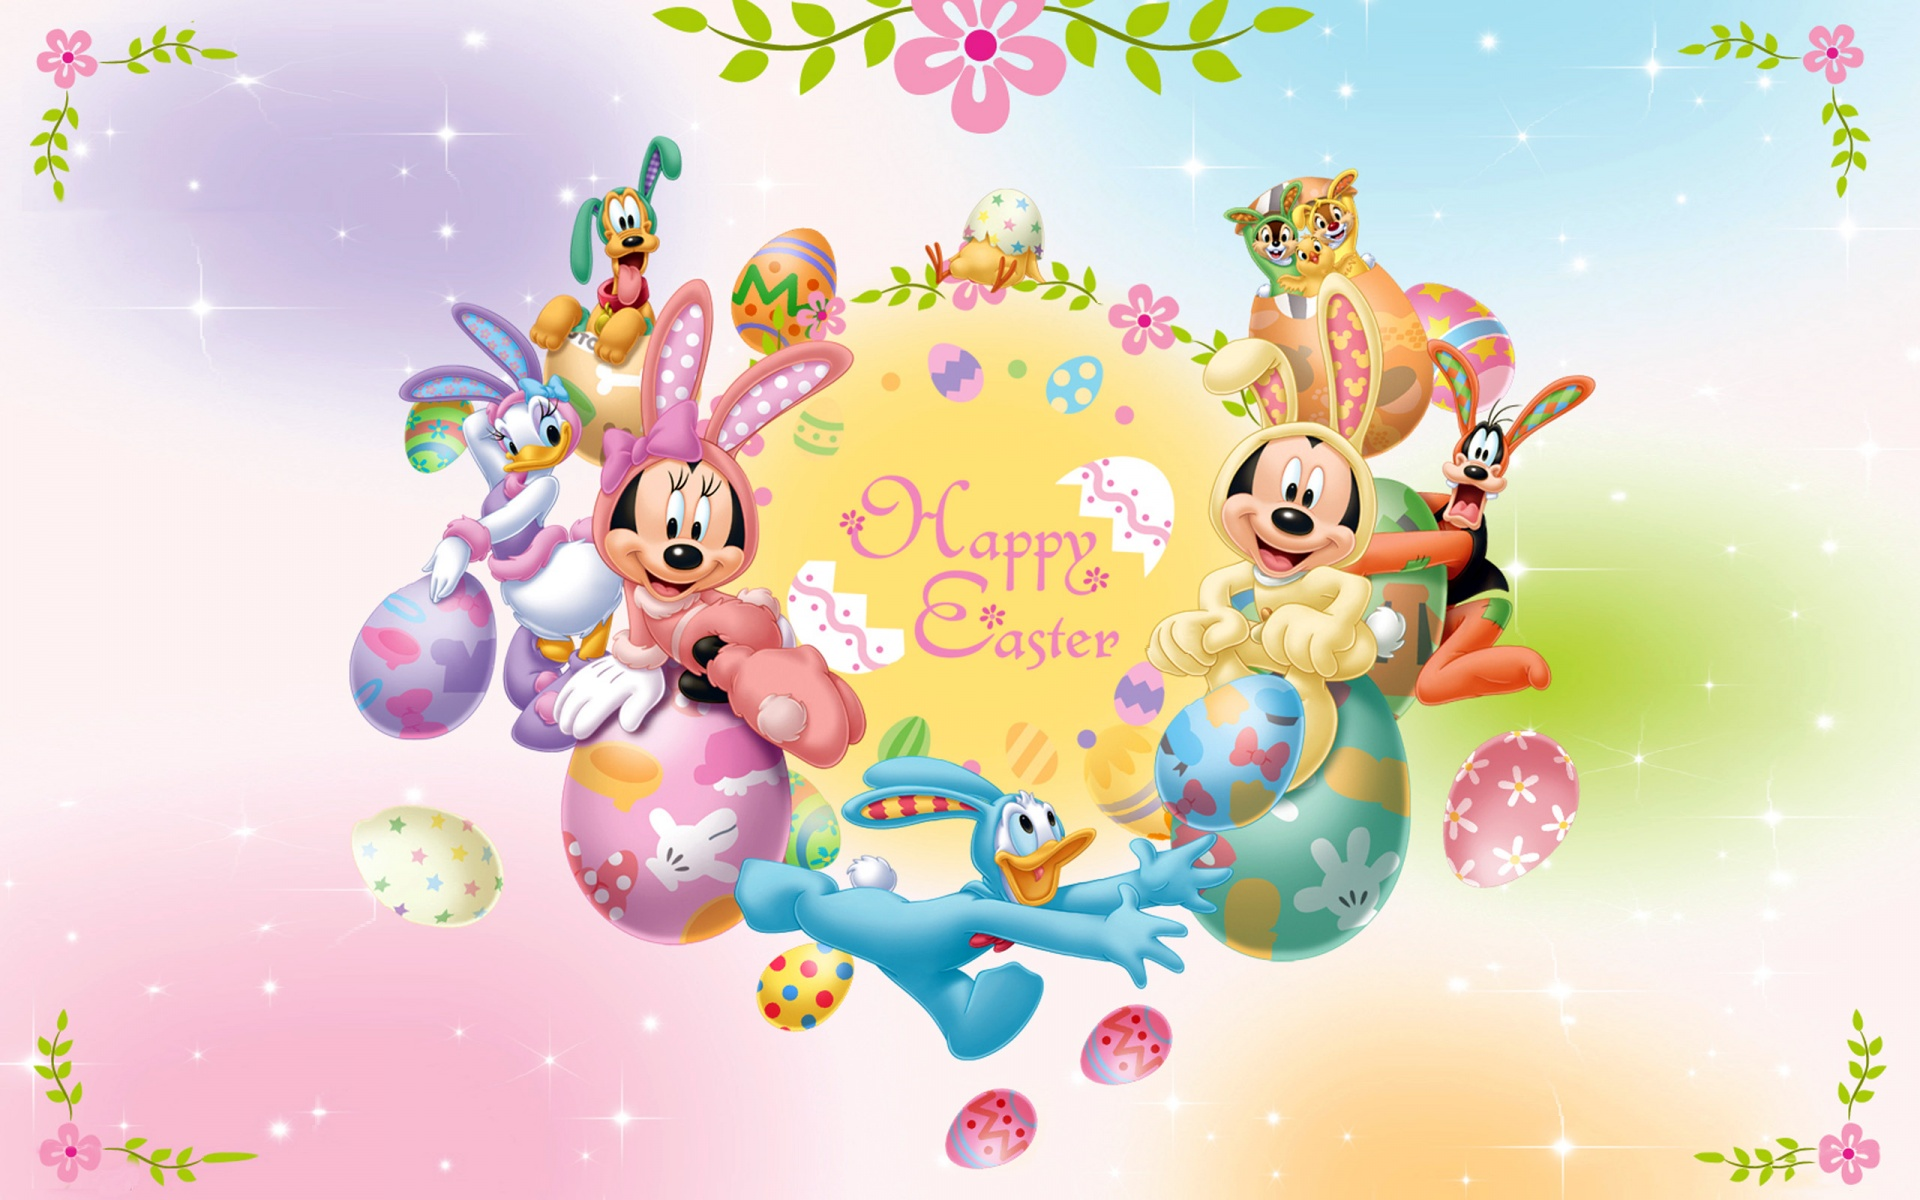 Happy Easter Images for Desktop 1920x1200